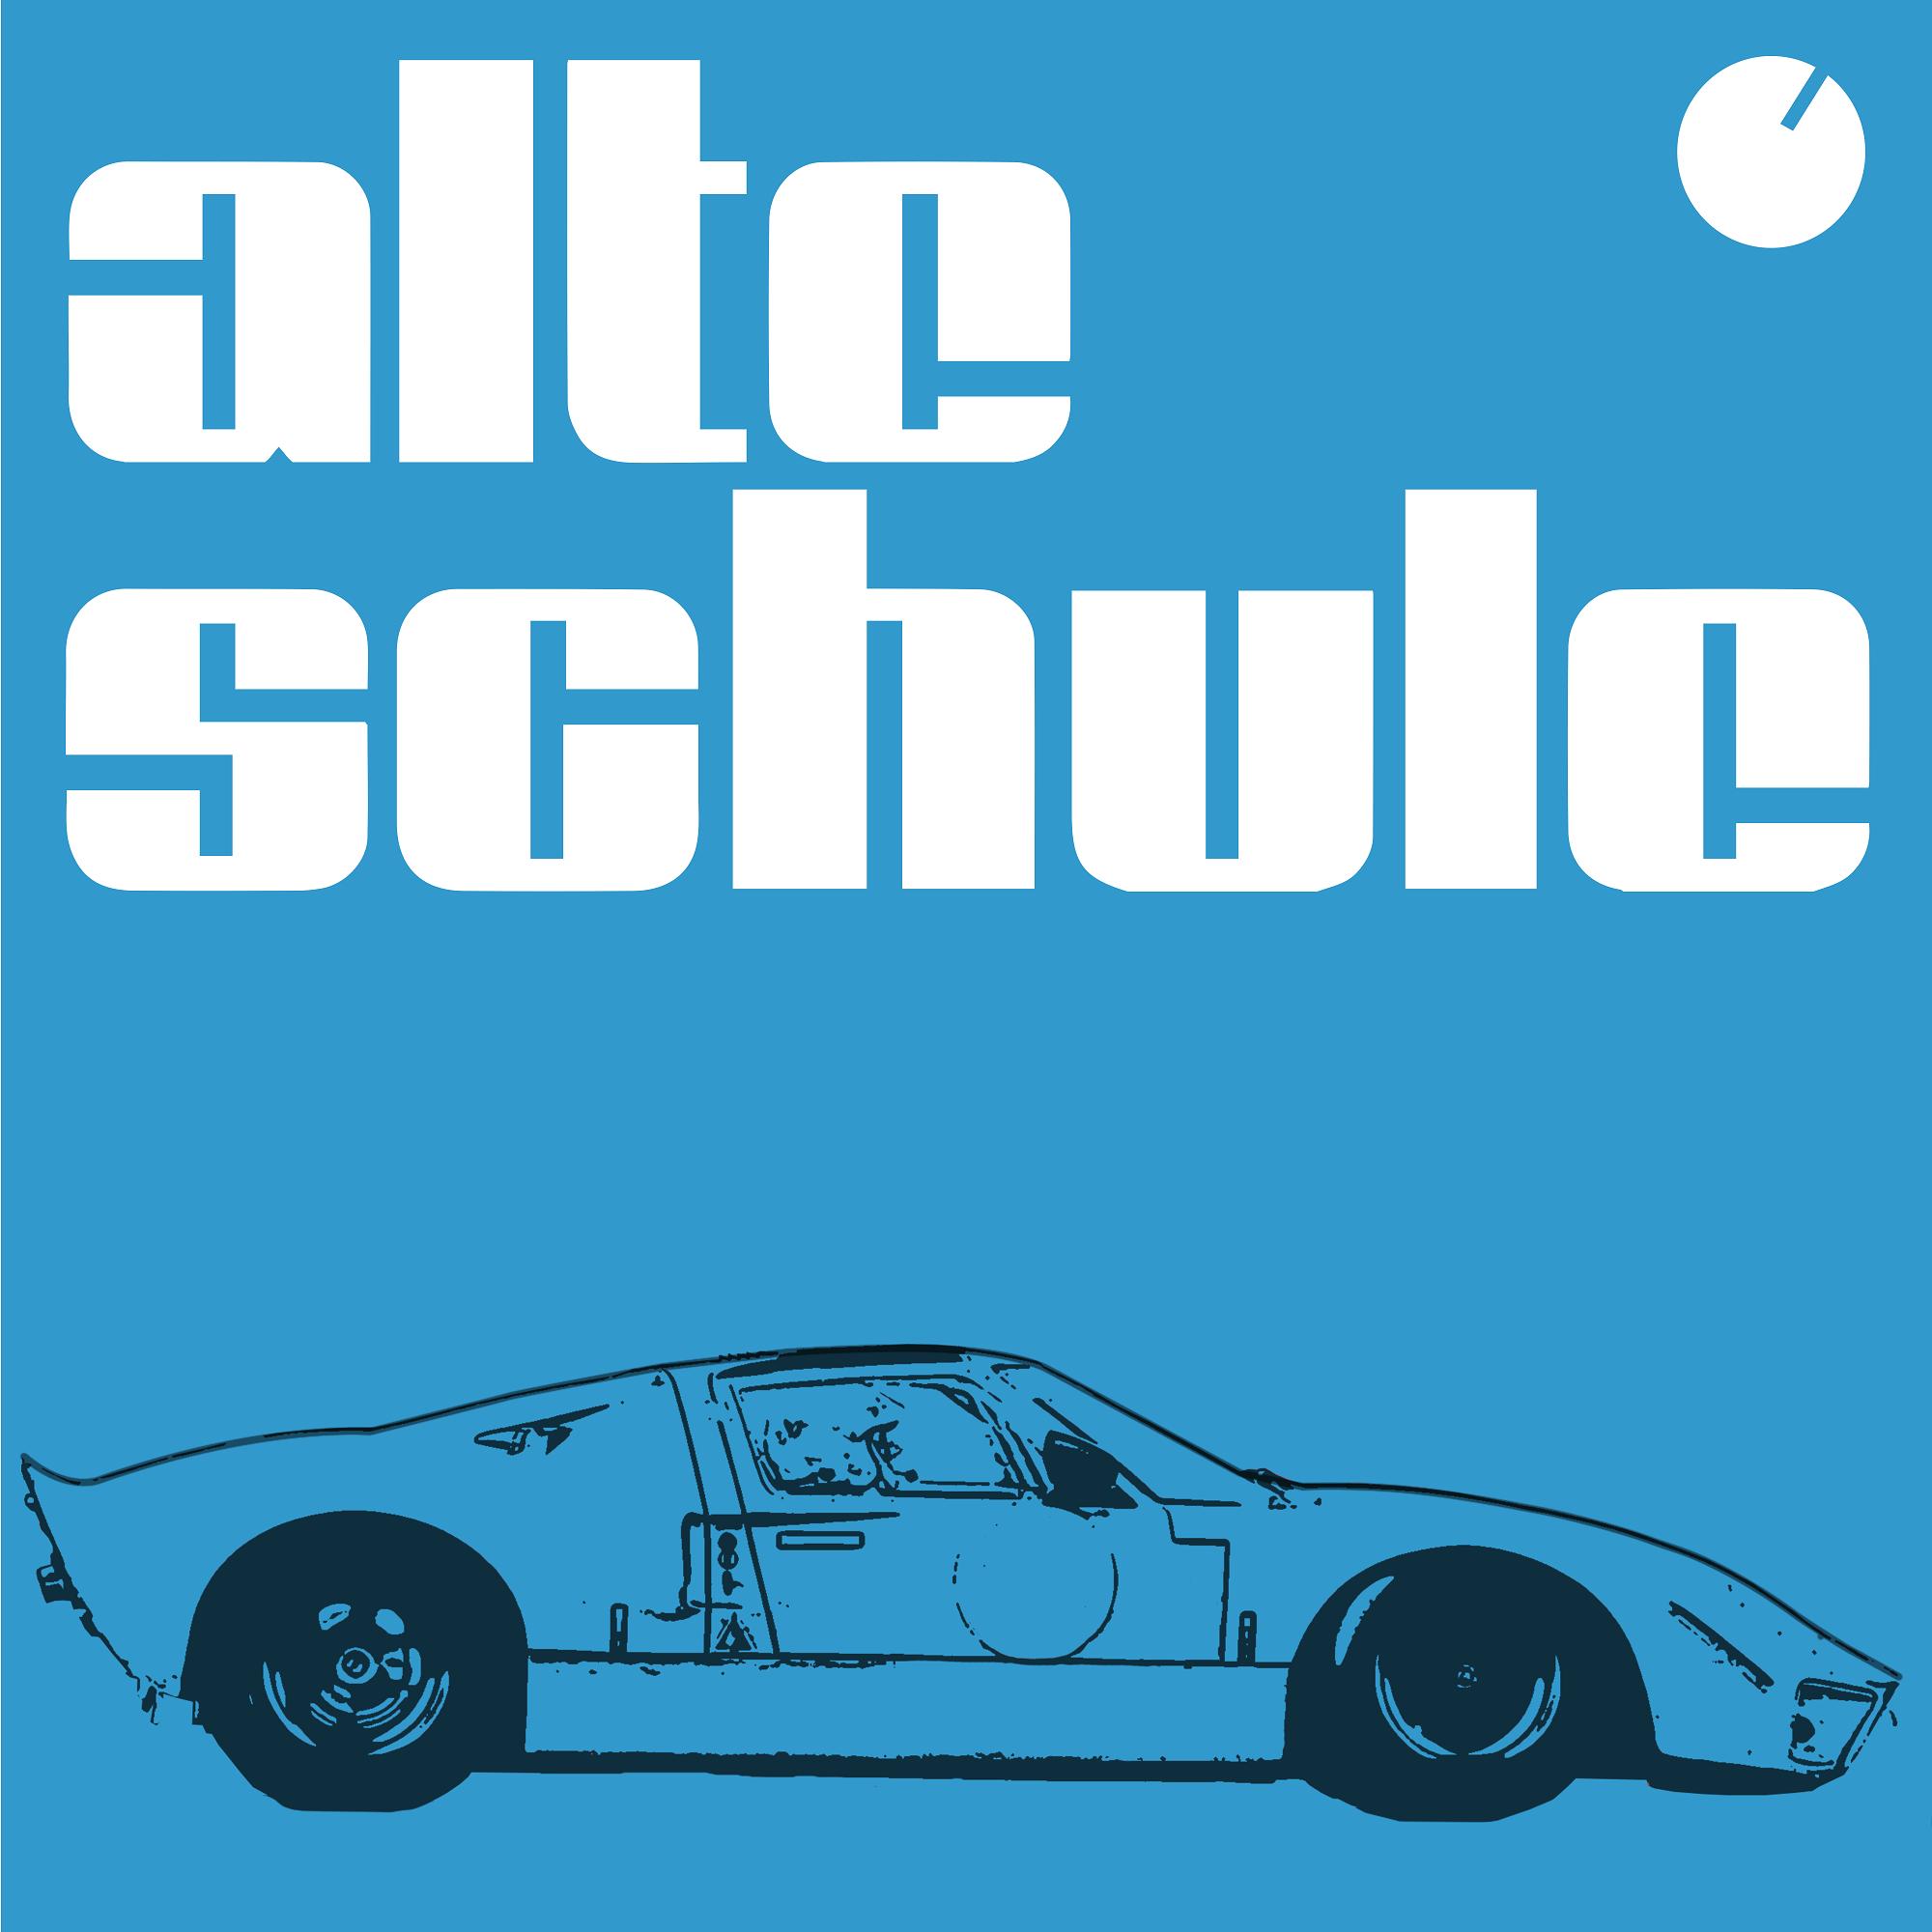 #04 Eckhard Schimpf